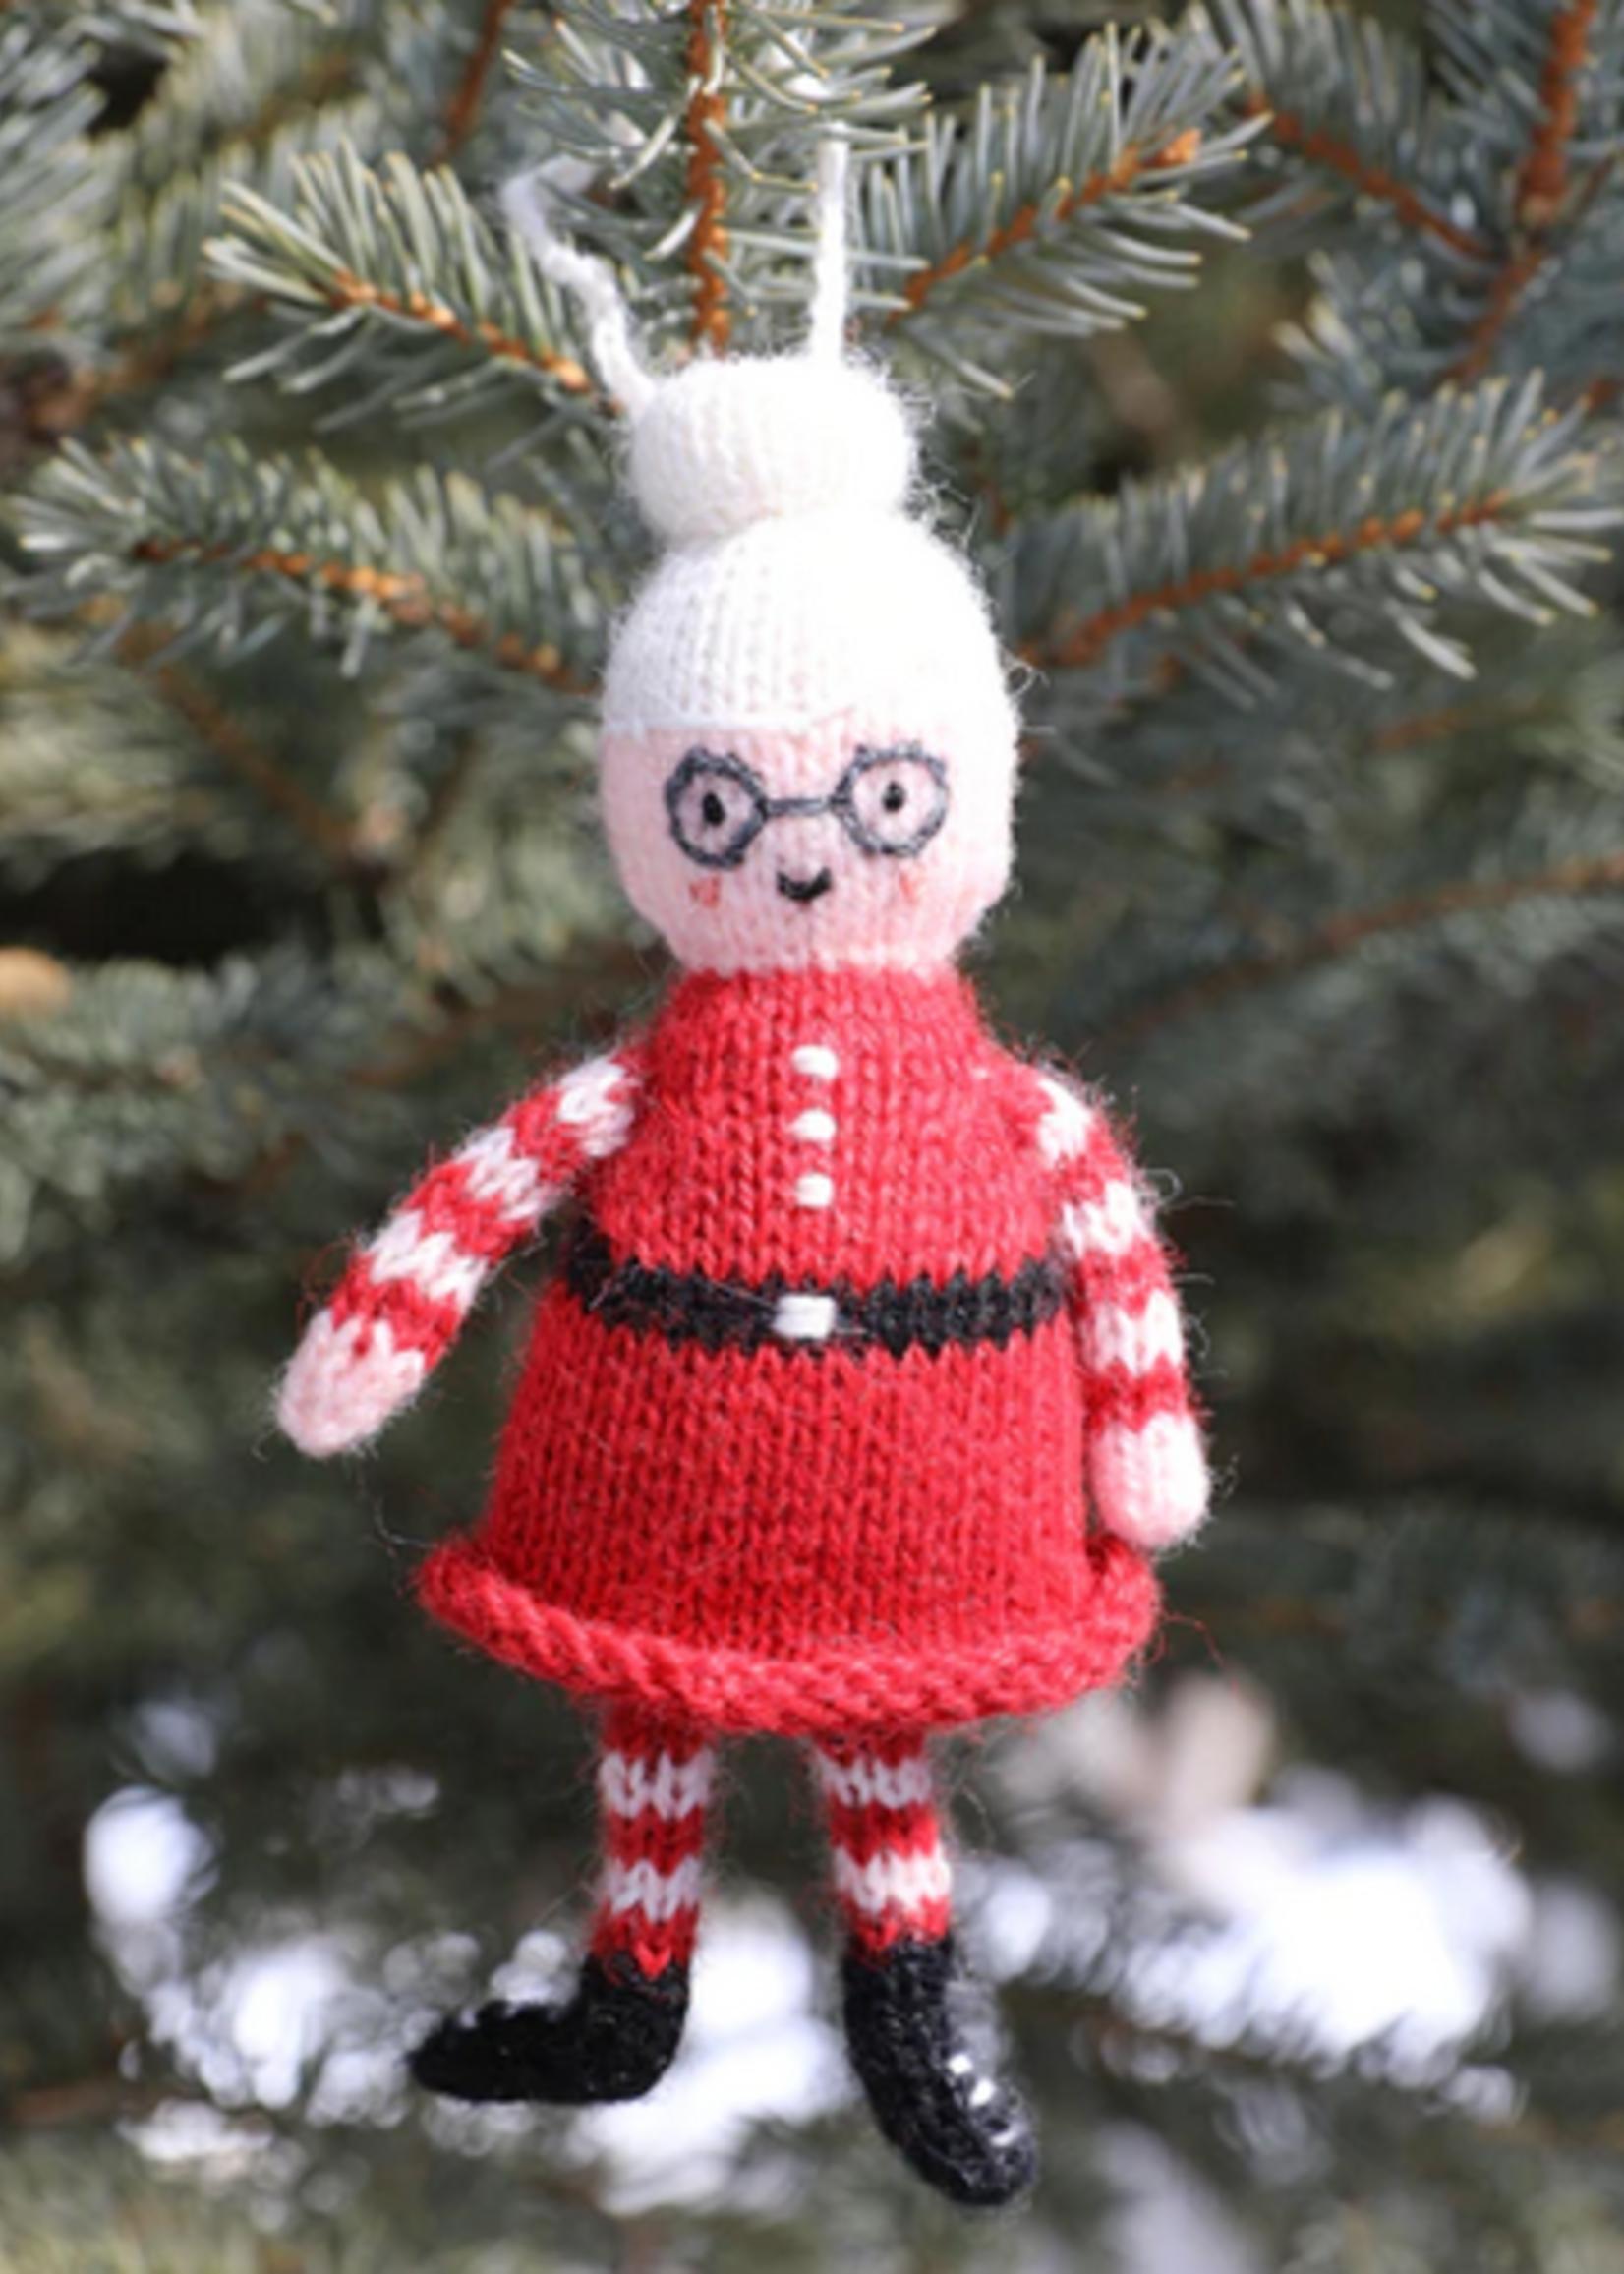 Ornament Mrs. Claus